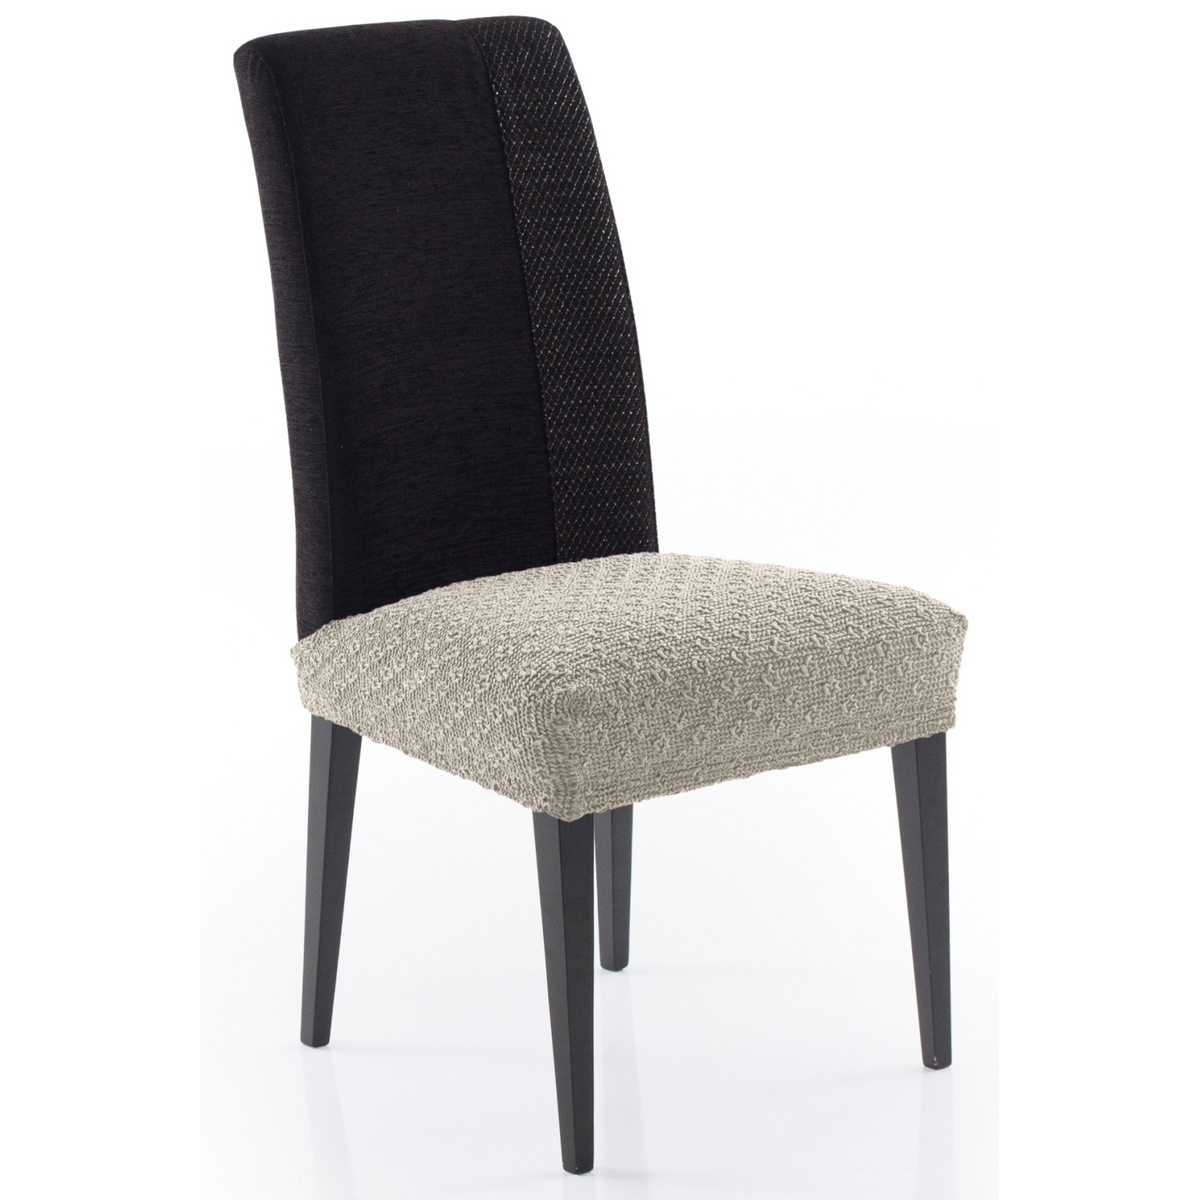 Forbyt Multielastický poťah na sedák na stoličku Martin béžová, 50 x 60 cm, sada 2 ks